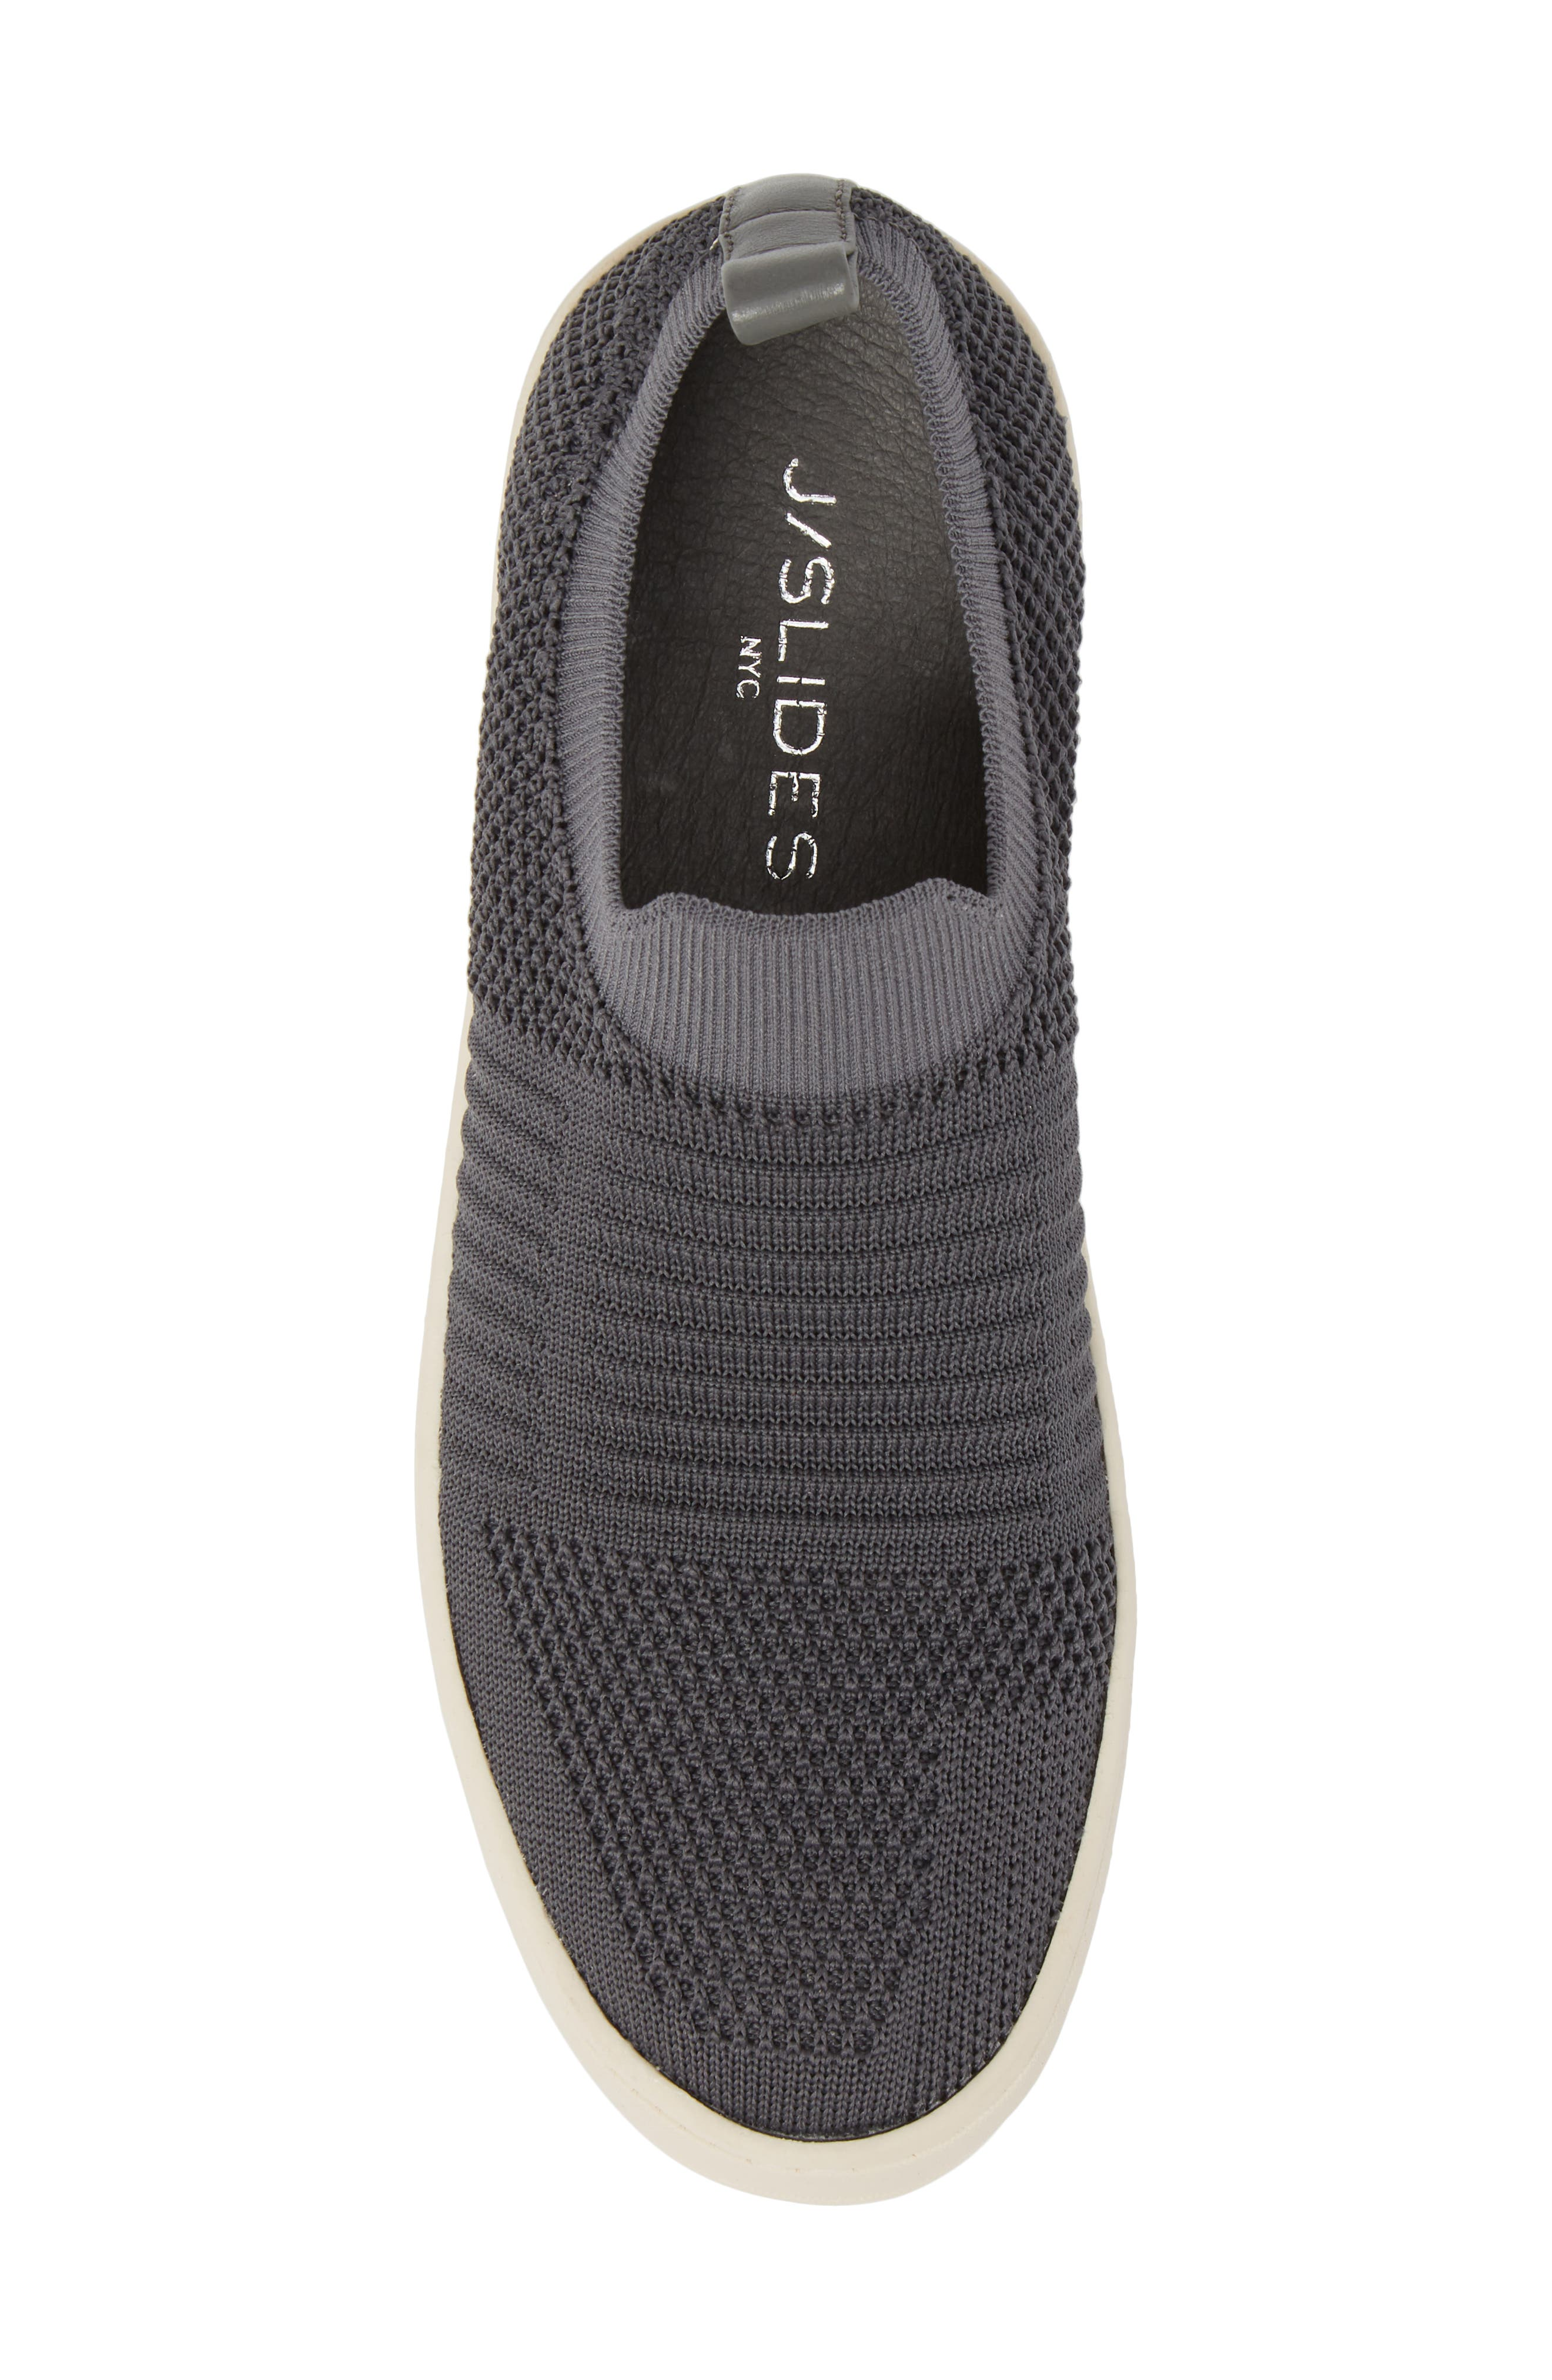 Hilo Platform Slip-On Sneaker,                             Alternate thumbnail 5, color,                             Grey Fabric